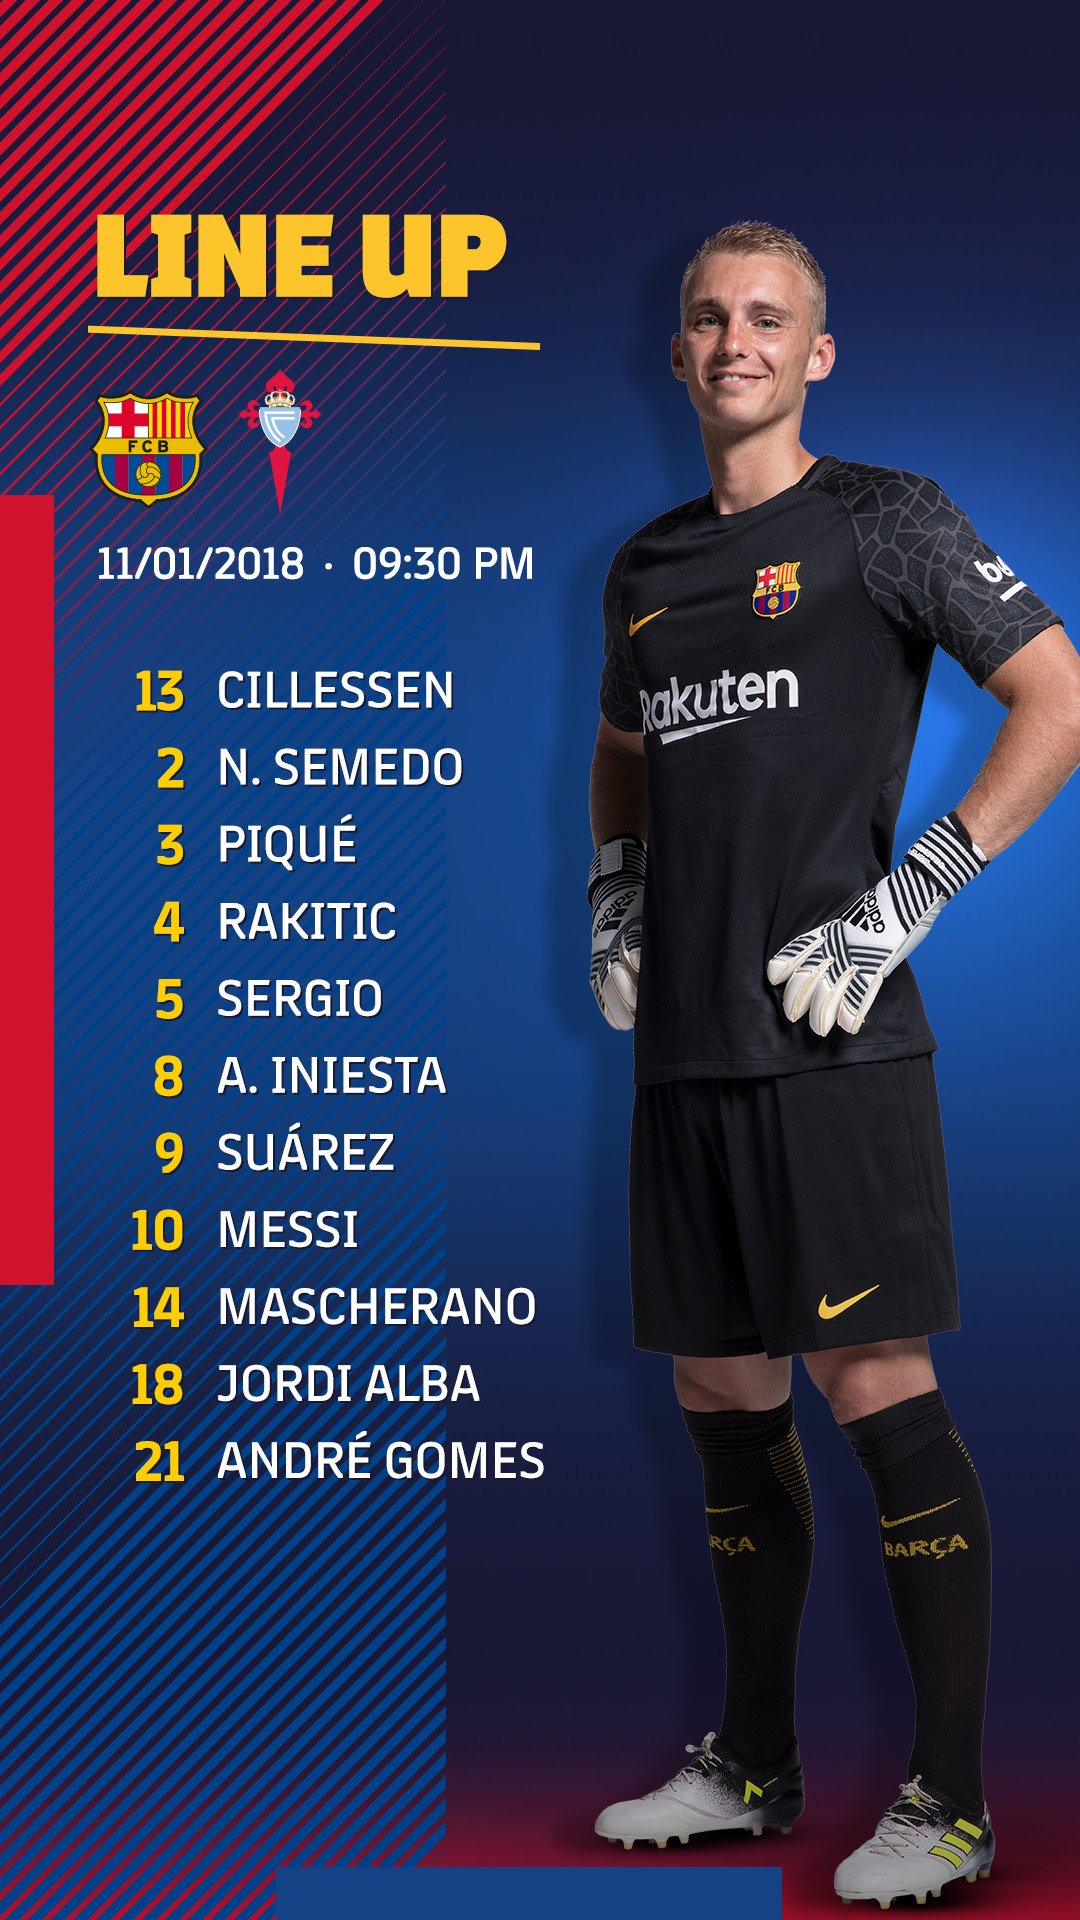 ���� Barça XI FC Barcelona v Celta #CopaBarça https://t.co/nN87IBJrQn